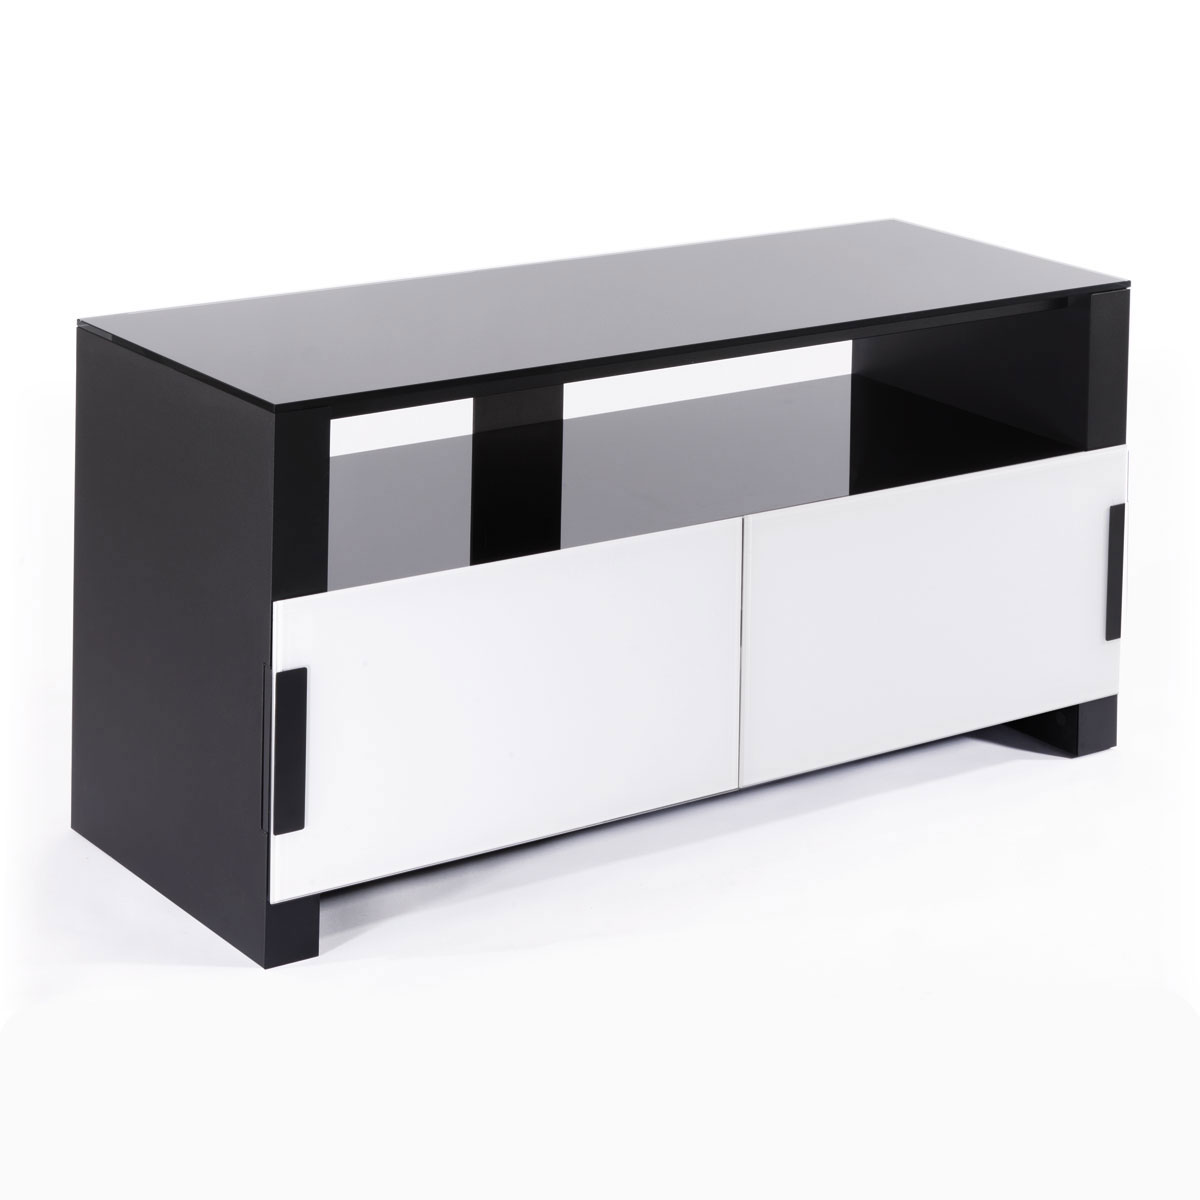 Erard Bilt1100 Blanc Meuble Tv Erard Group Sur Ldlc Com # Erard Meuble Tv